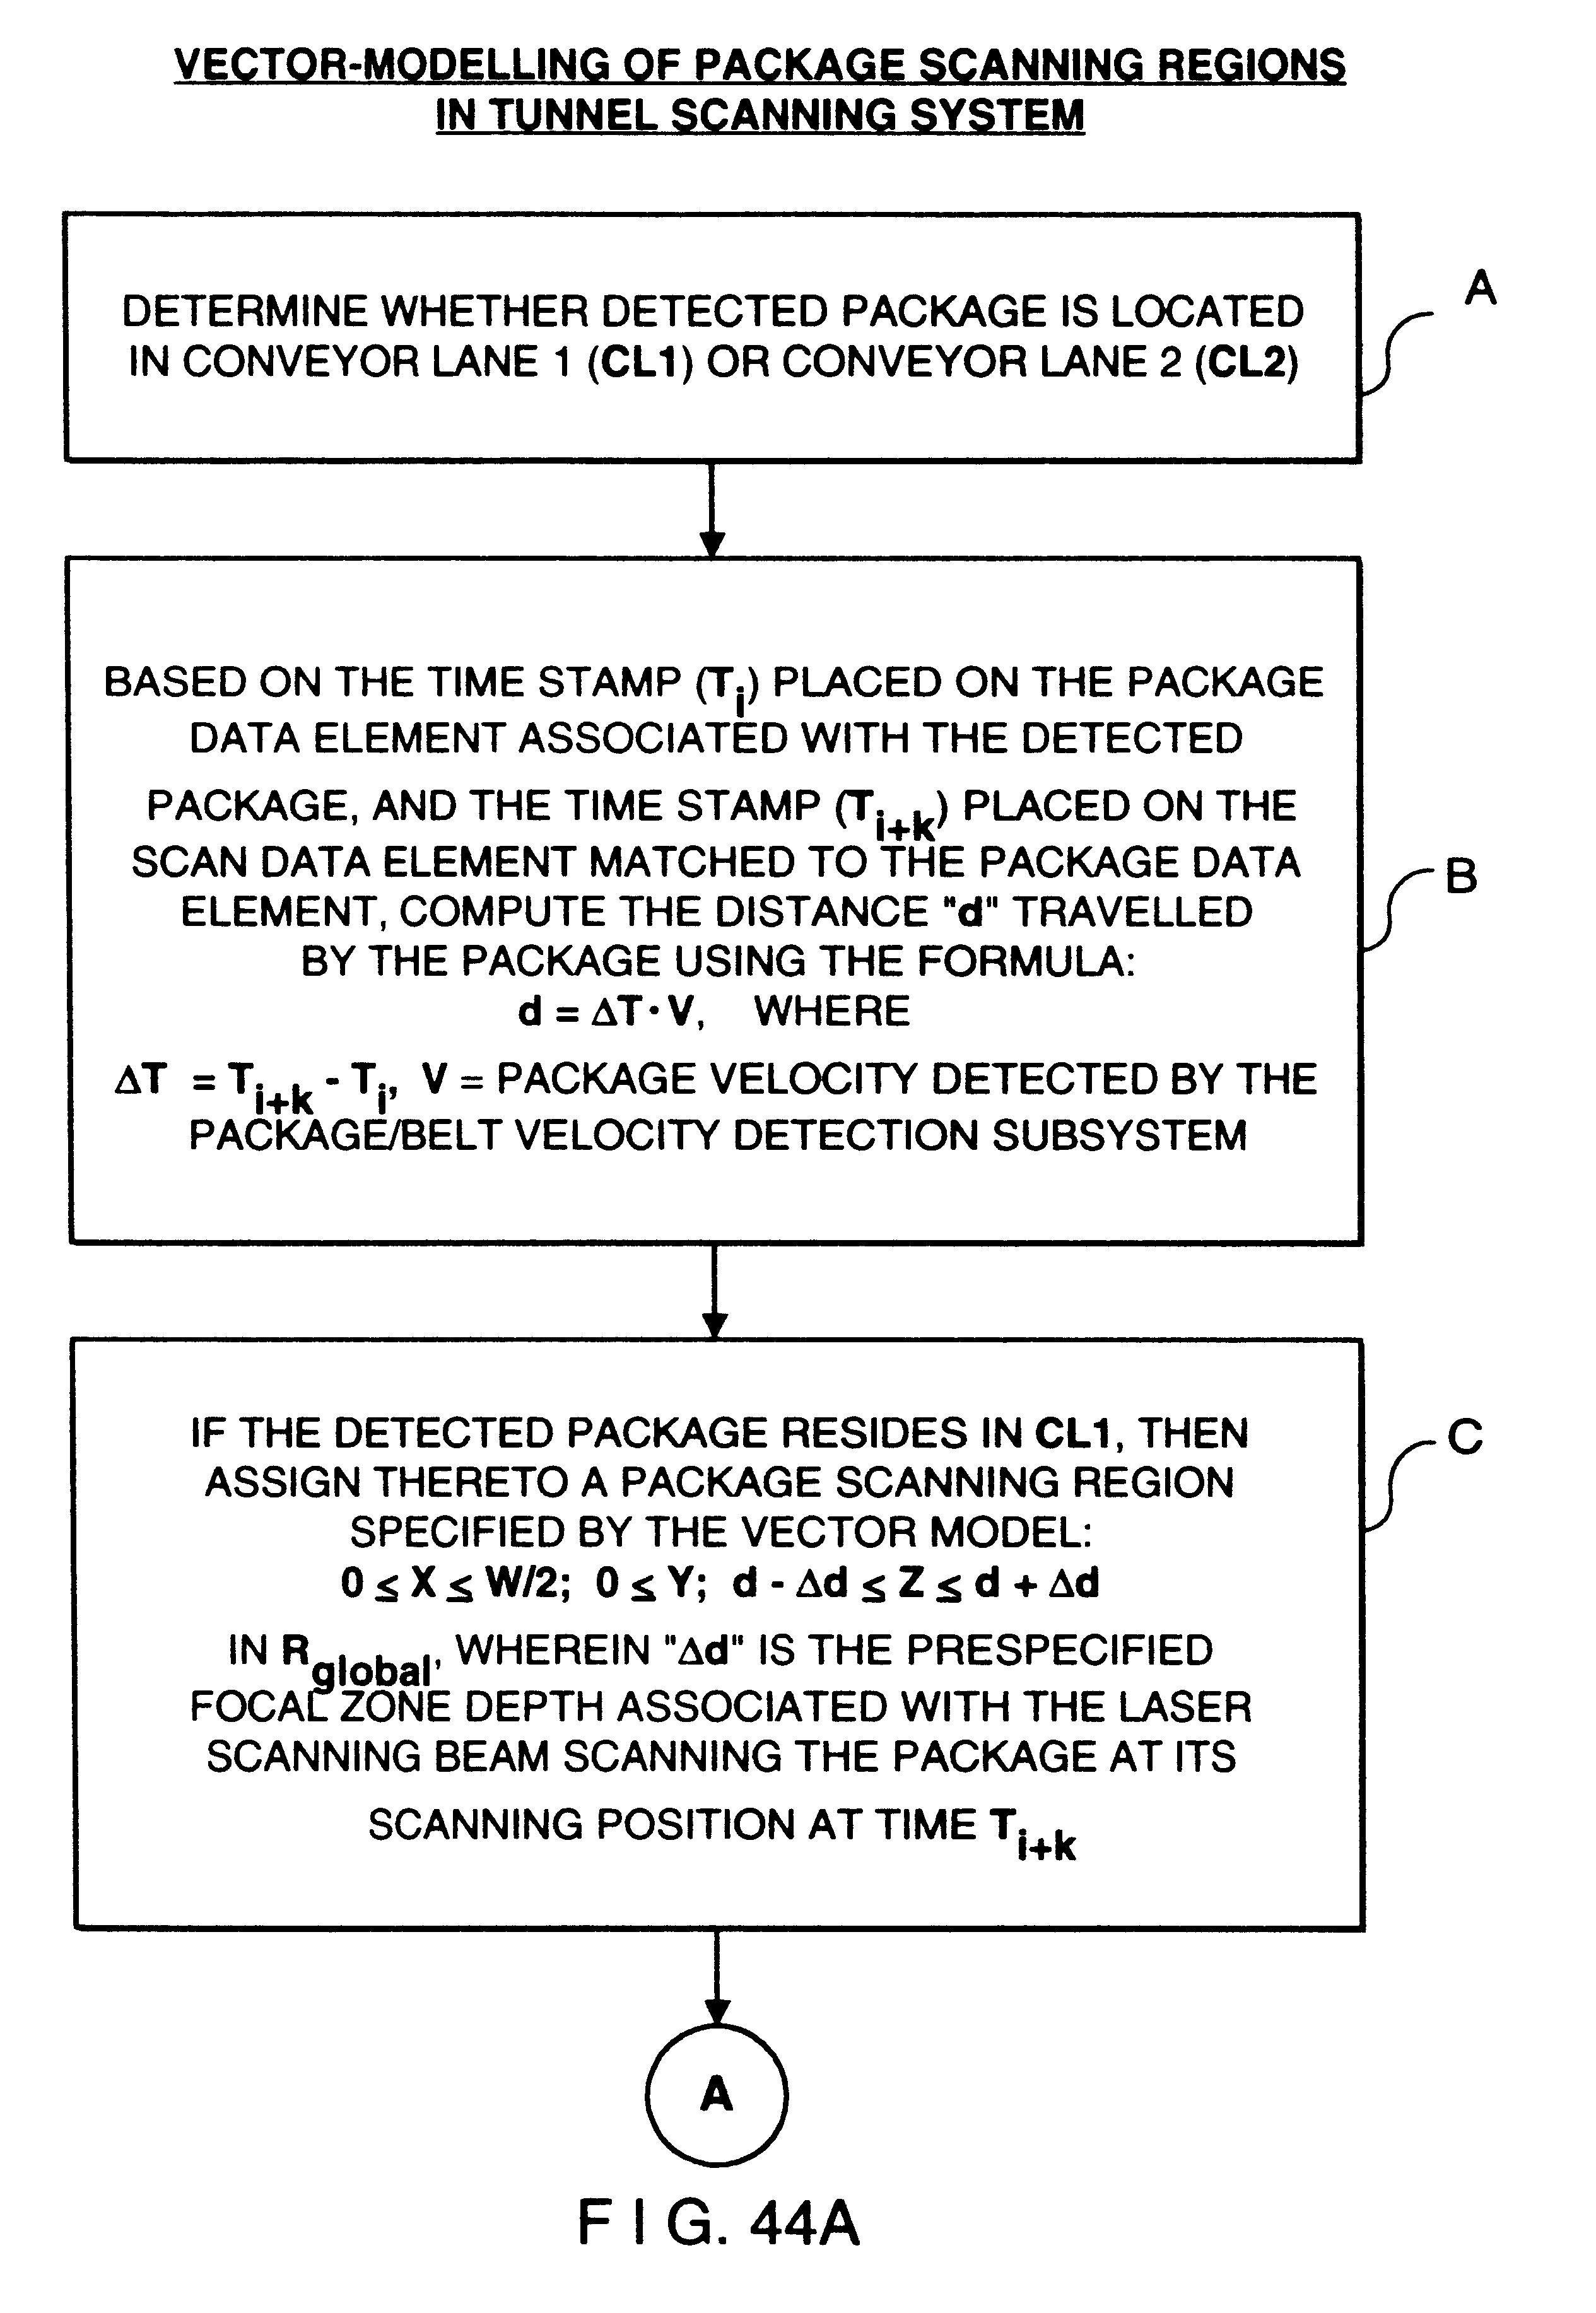 Patent US 6,554,189 B1